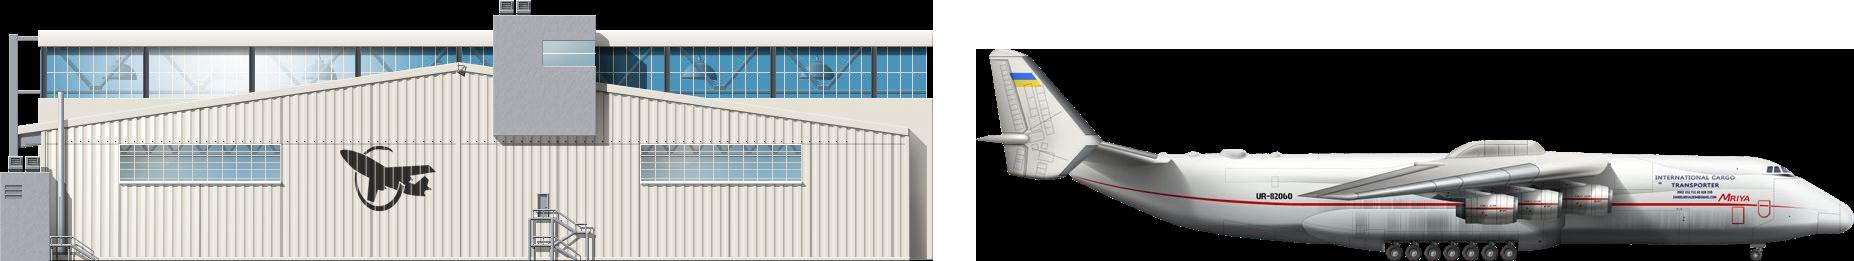 Antonov Take-Off